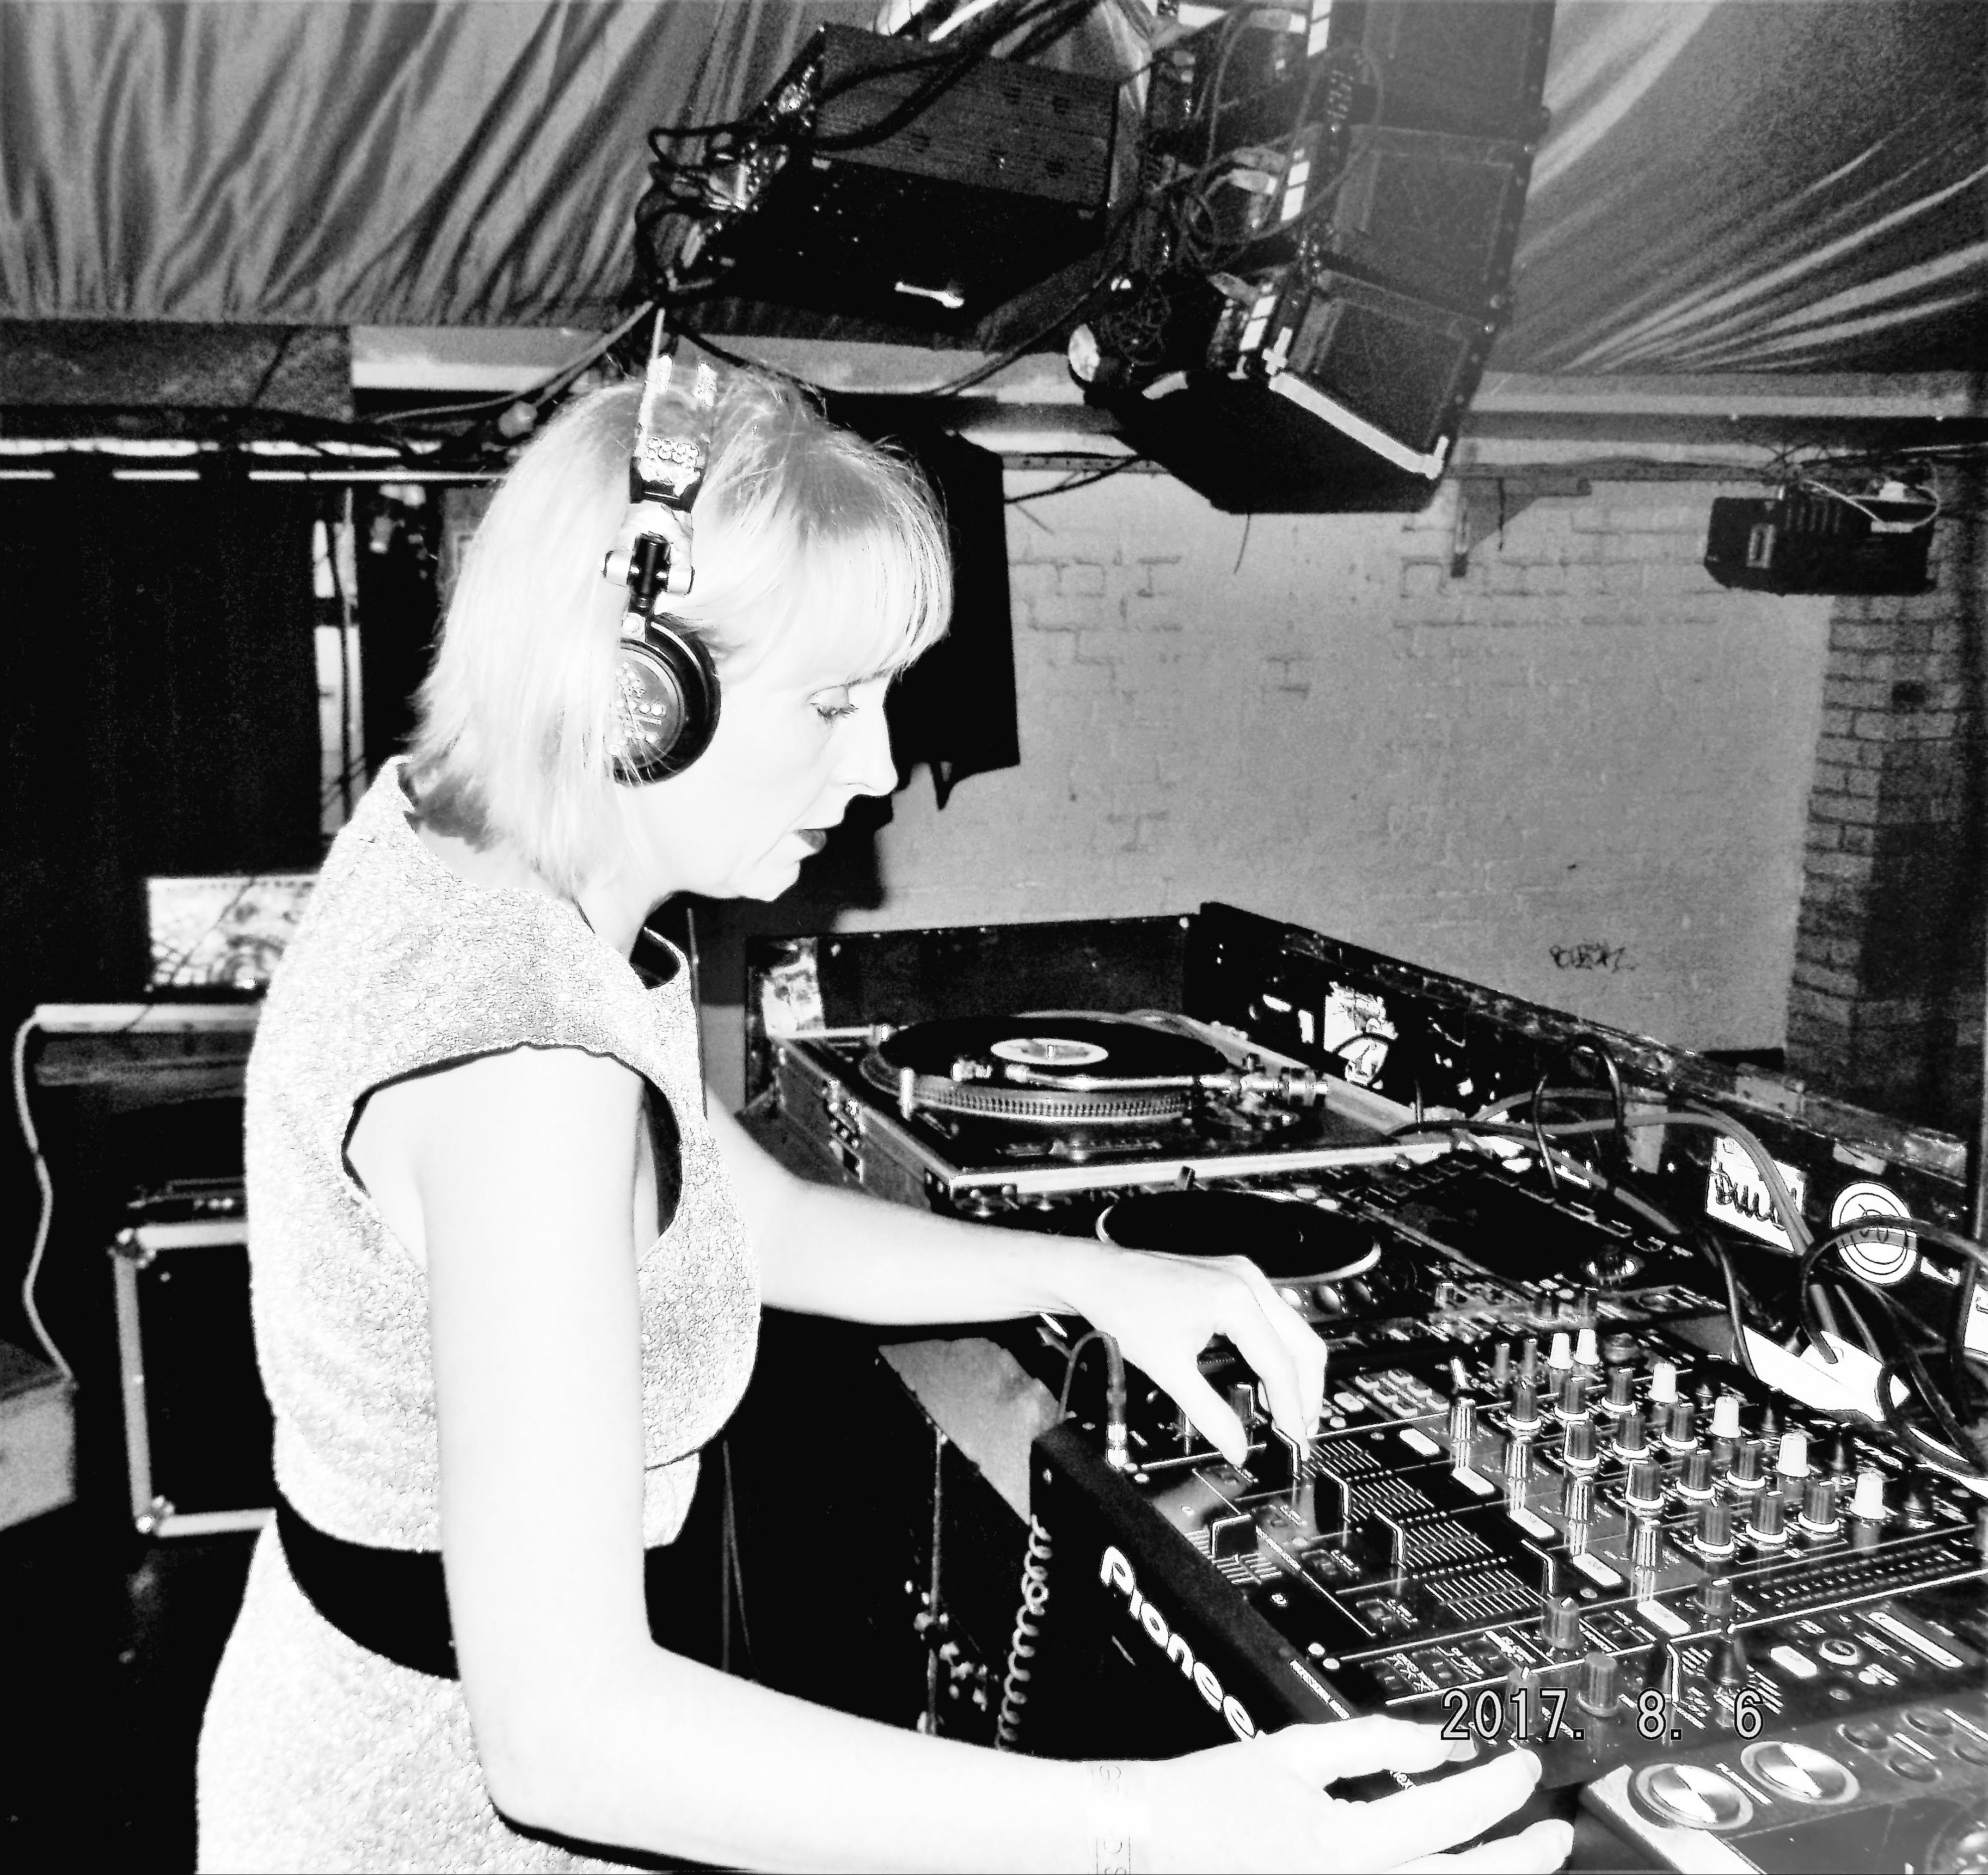 DJ Laynee's Top 10 Tech house & Techno